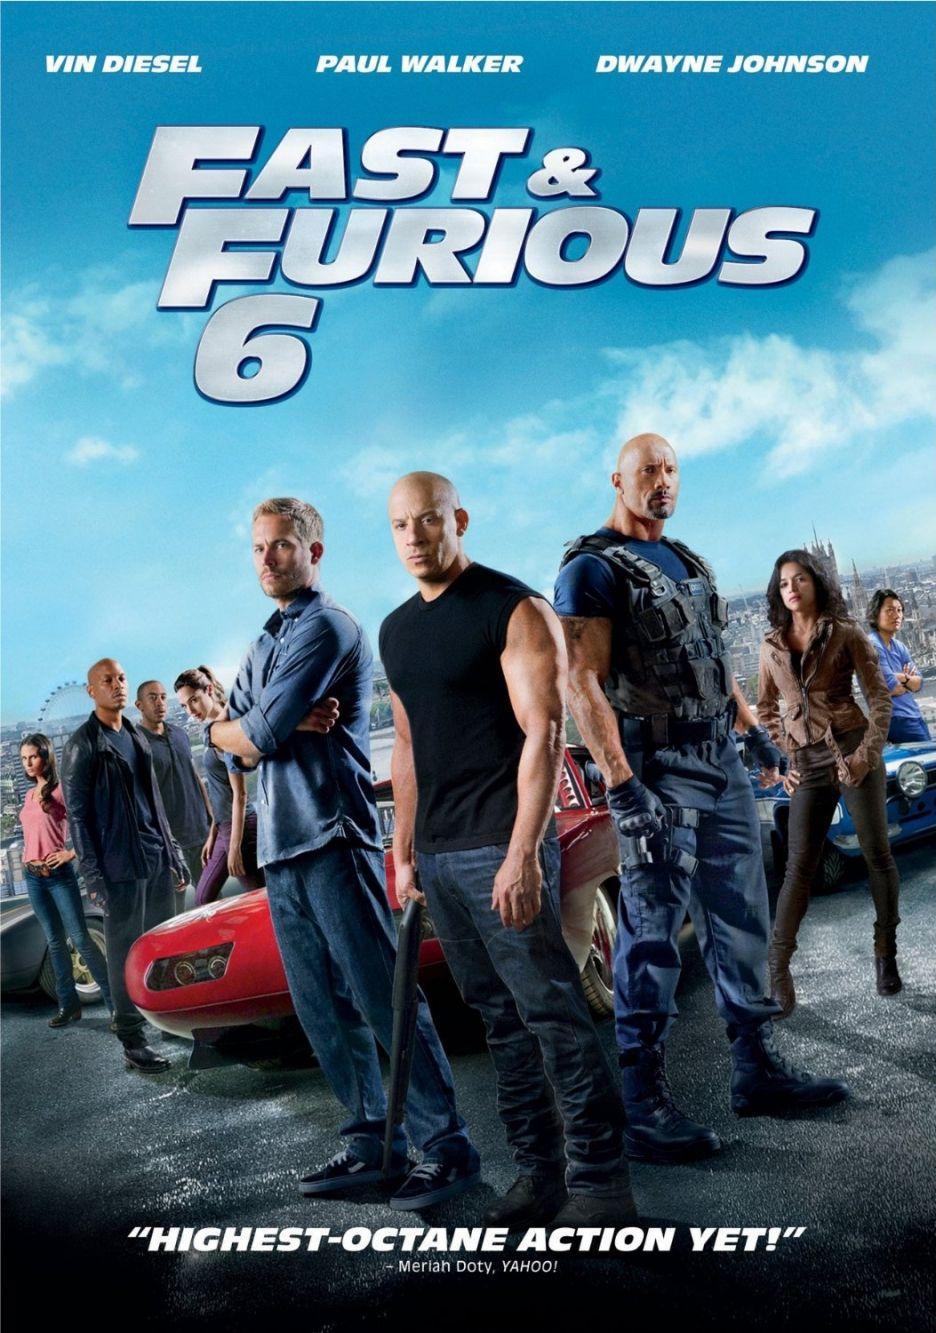 Fast And Furious Peliculas Completas Peliculas Fast And Furious